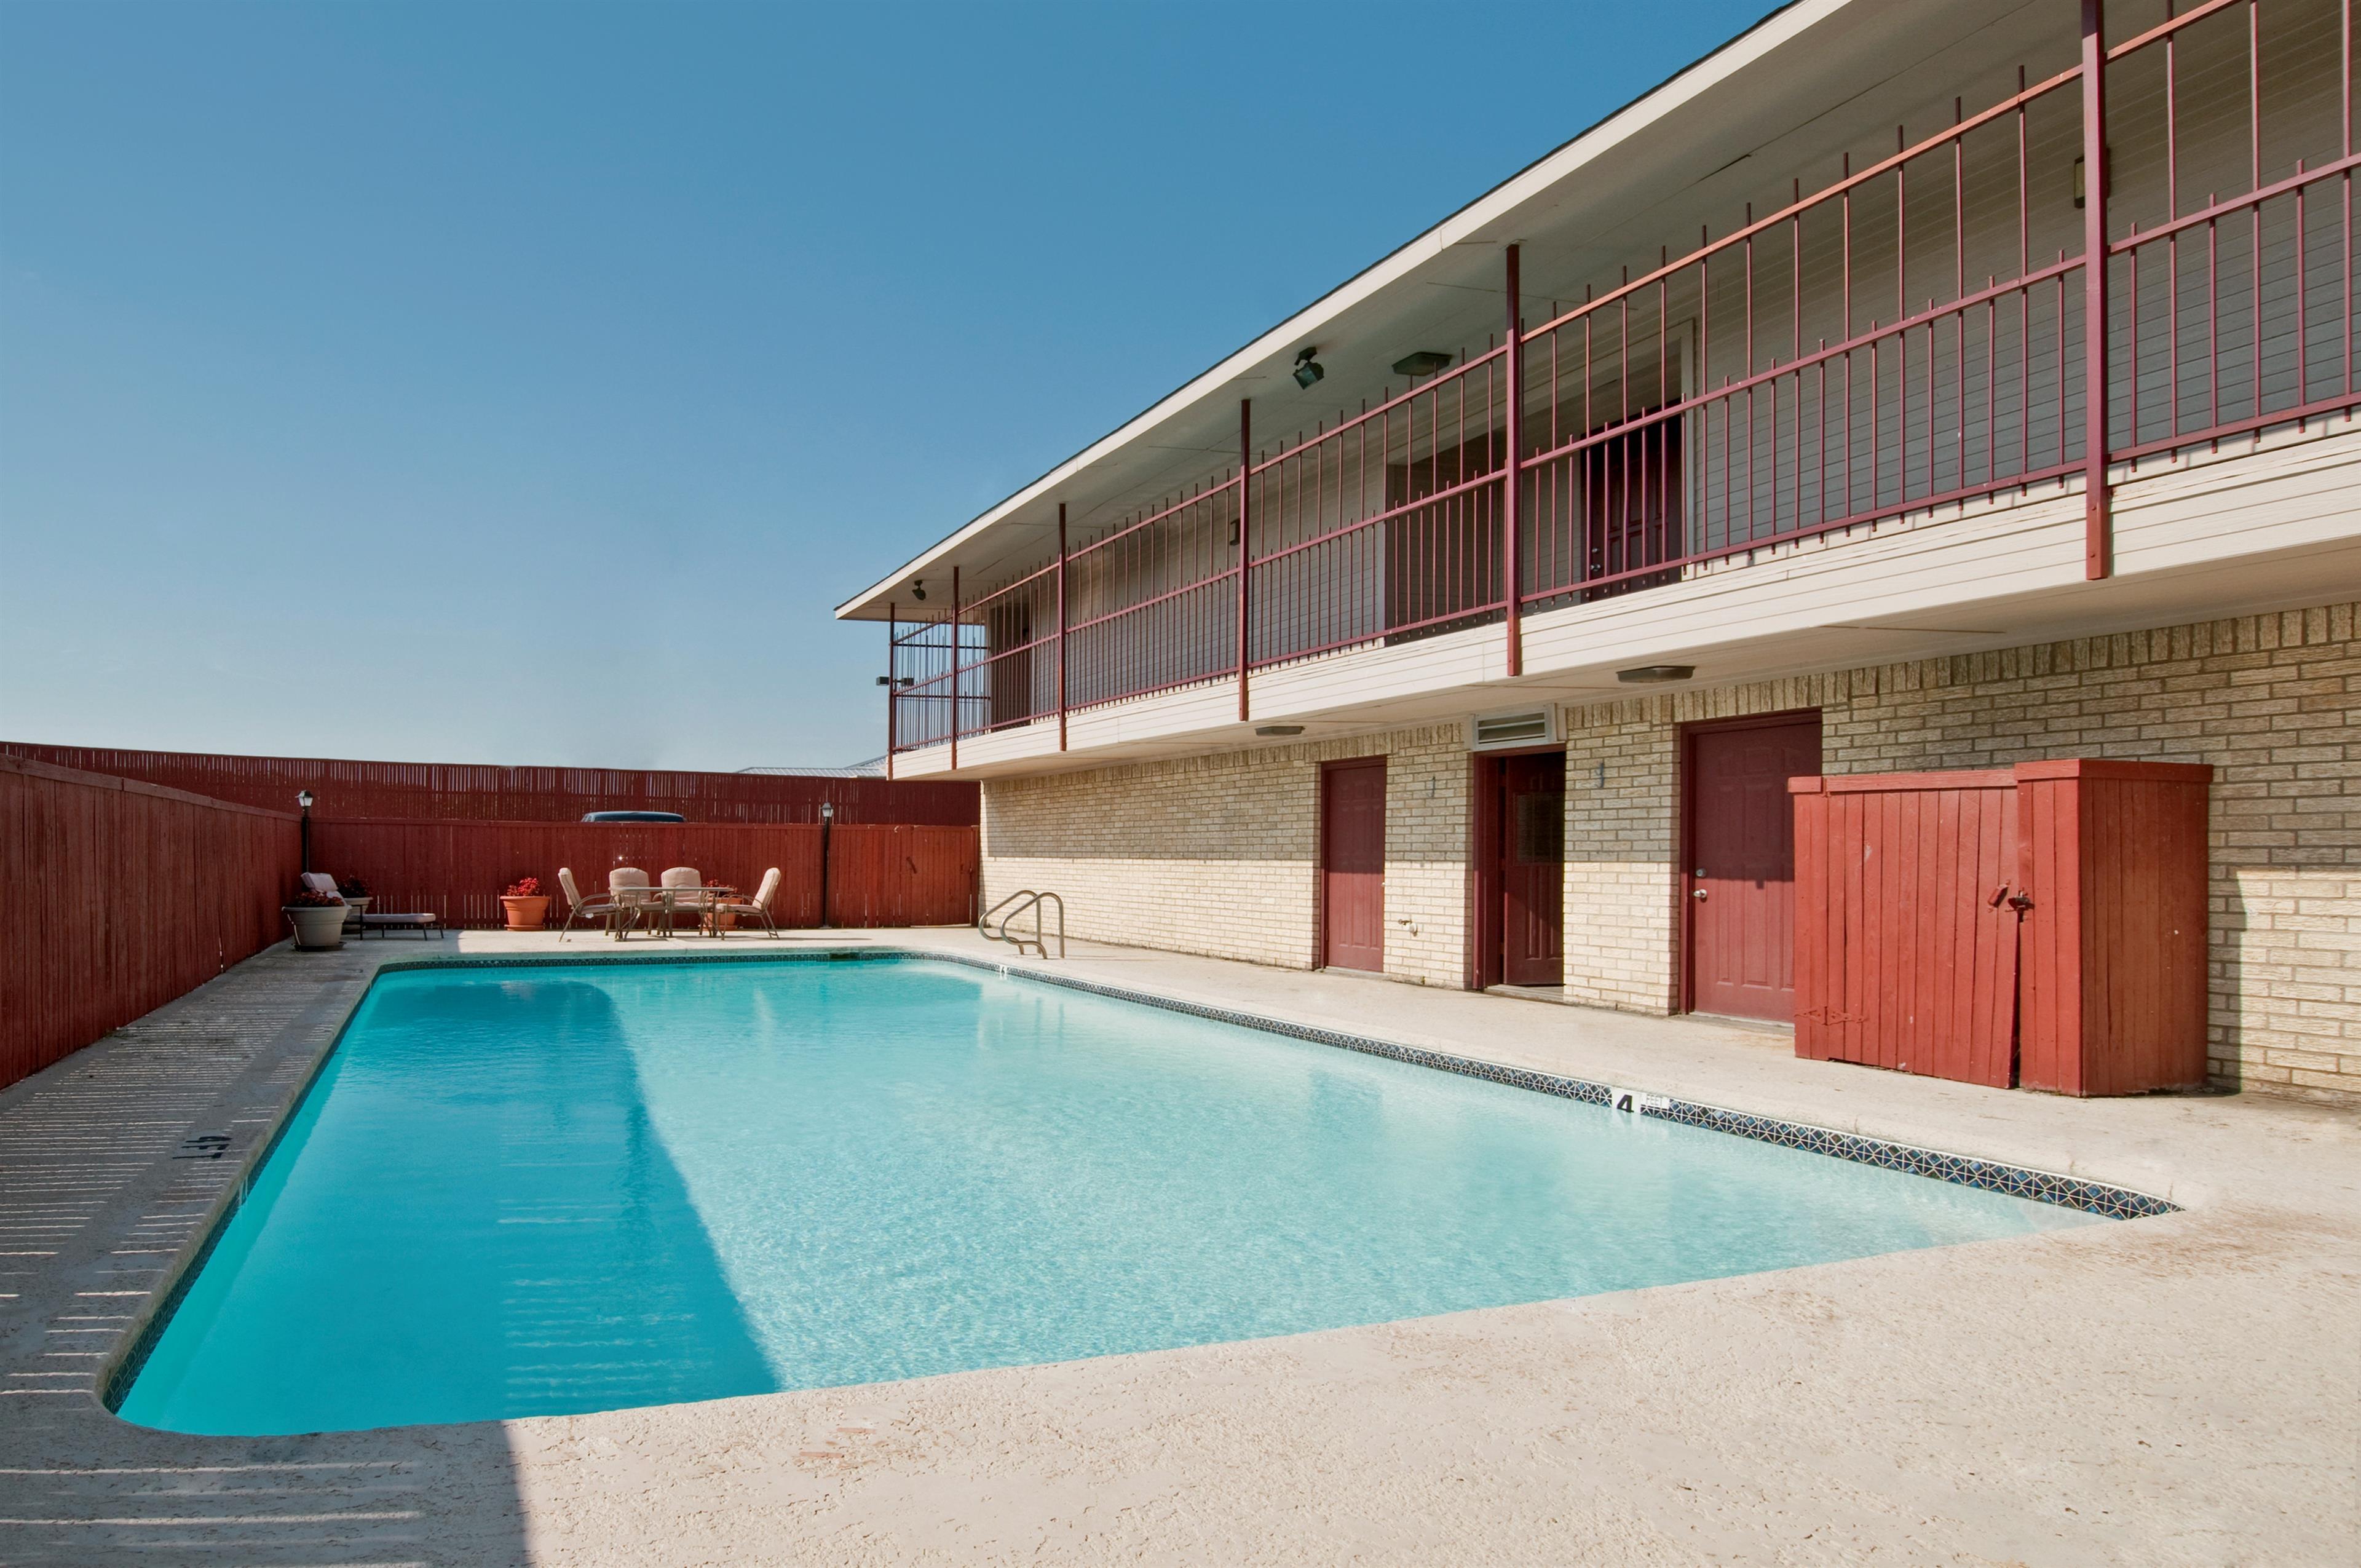 Americas Best Value Inn Midlothian Cedar Hill Midlothian Texas Tx